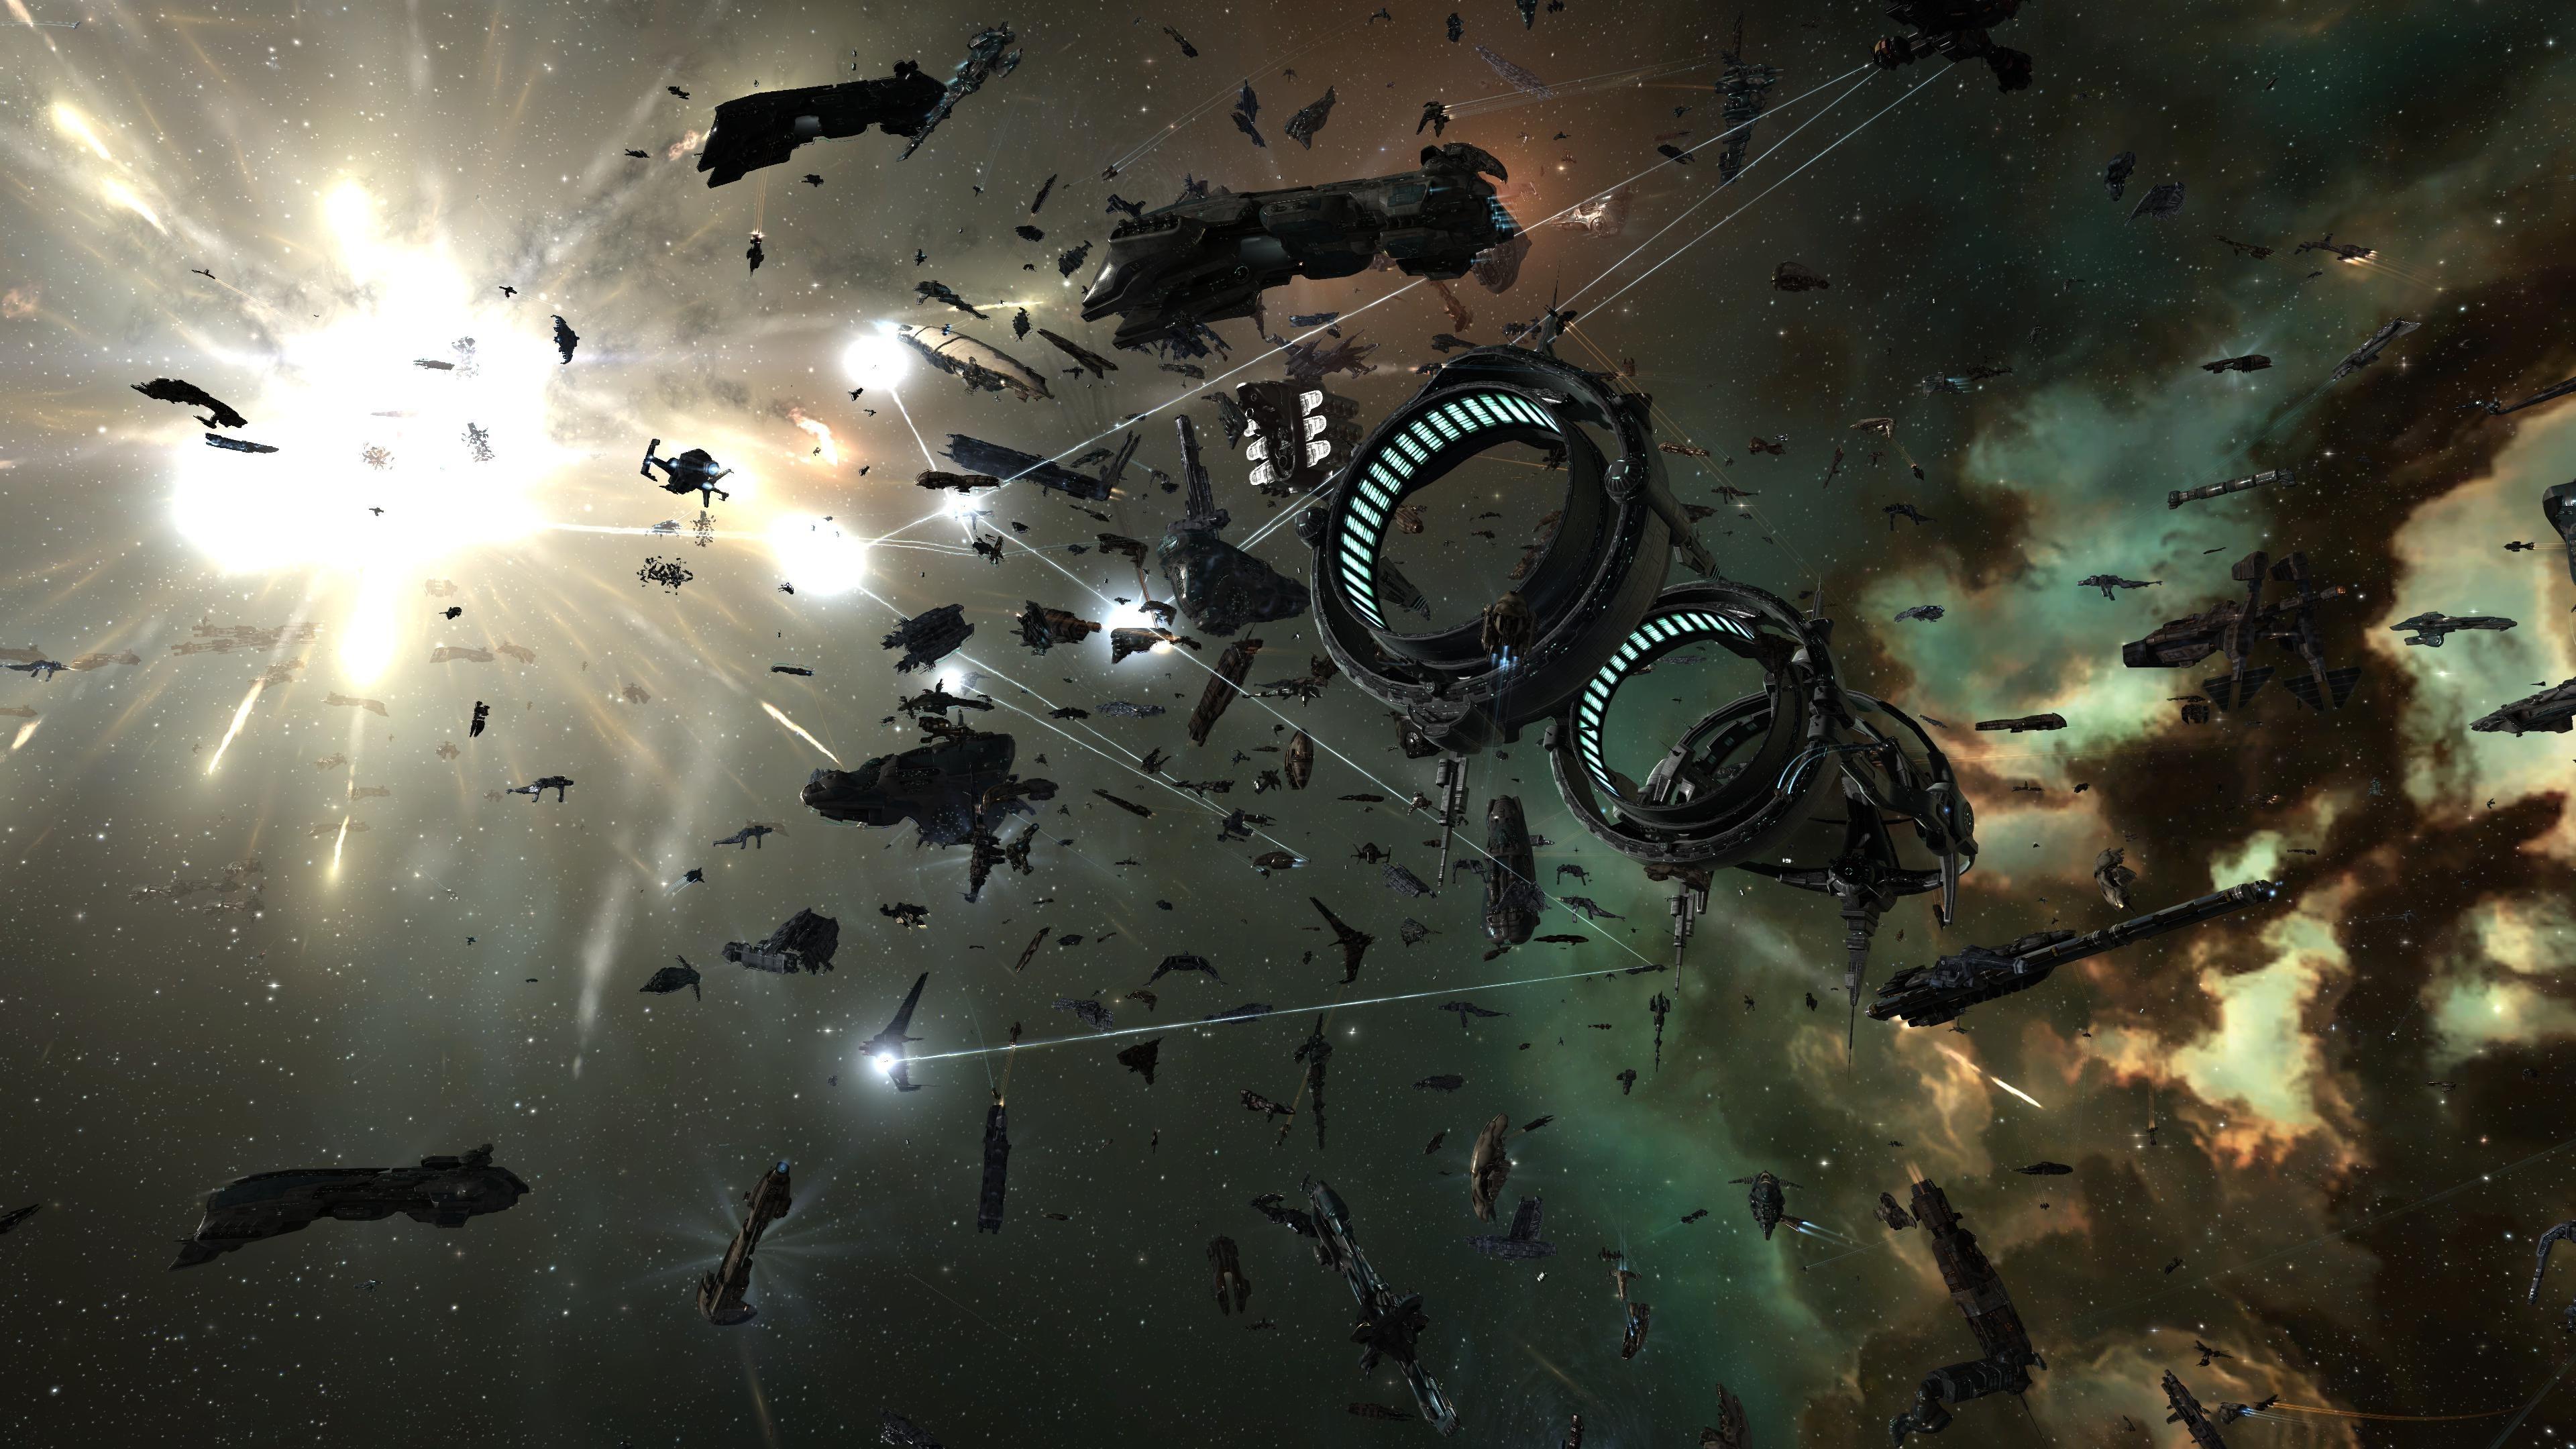 EVE Online, Burn Jita, Space, Spaceship, Space Battle